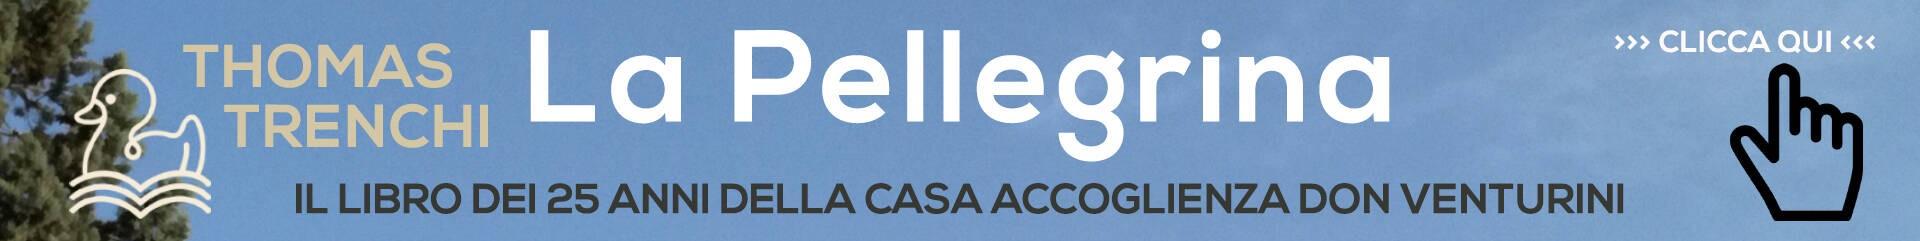 Banner Pellegrina